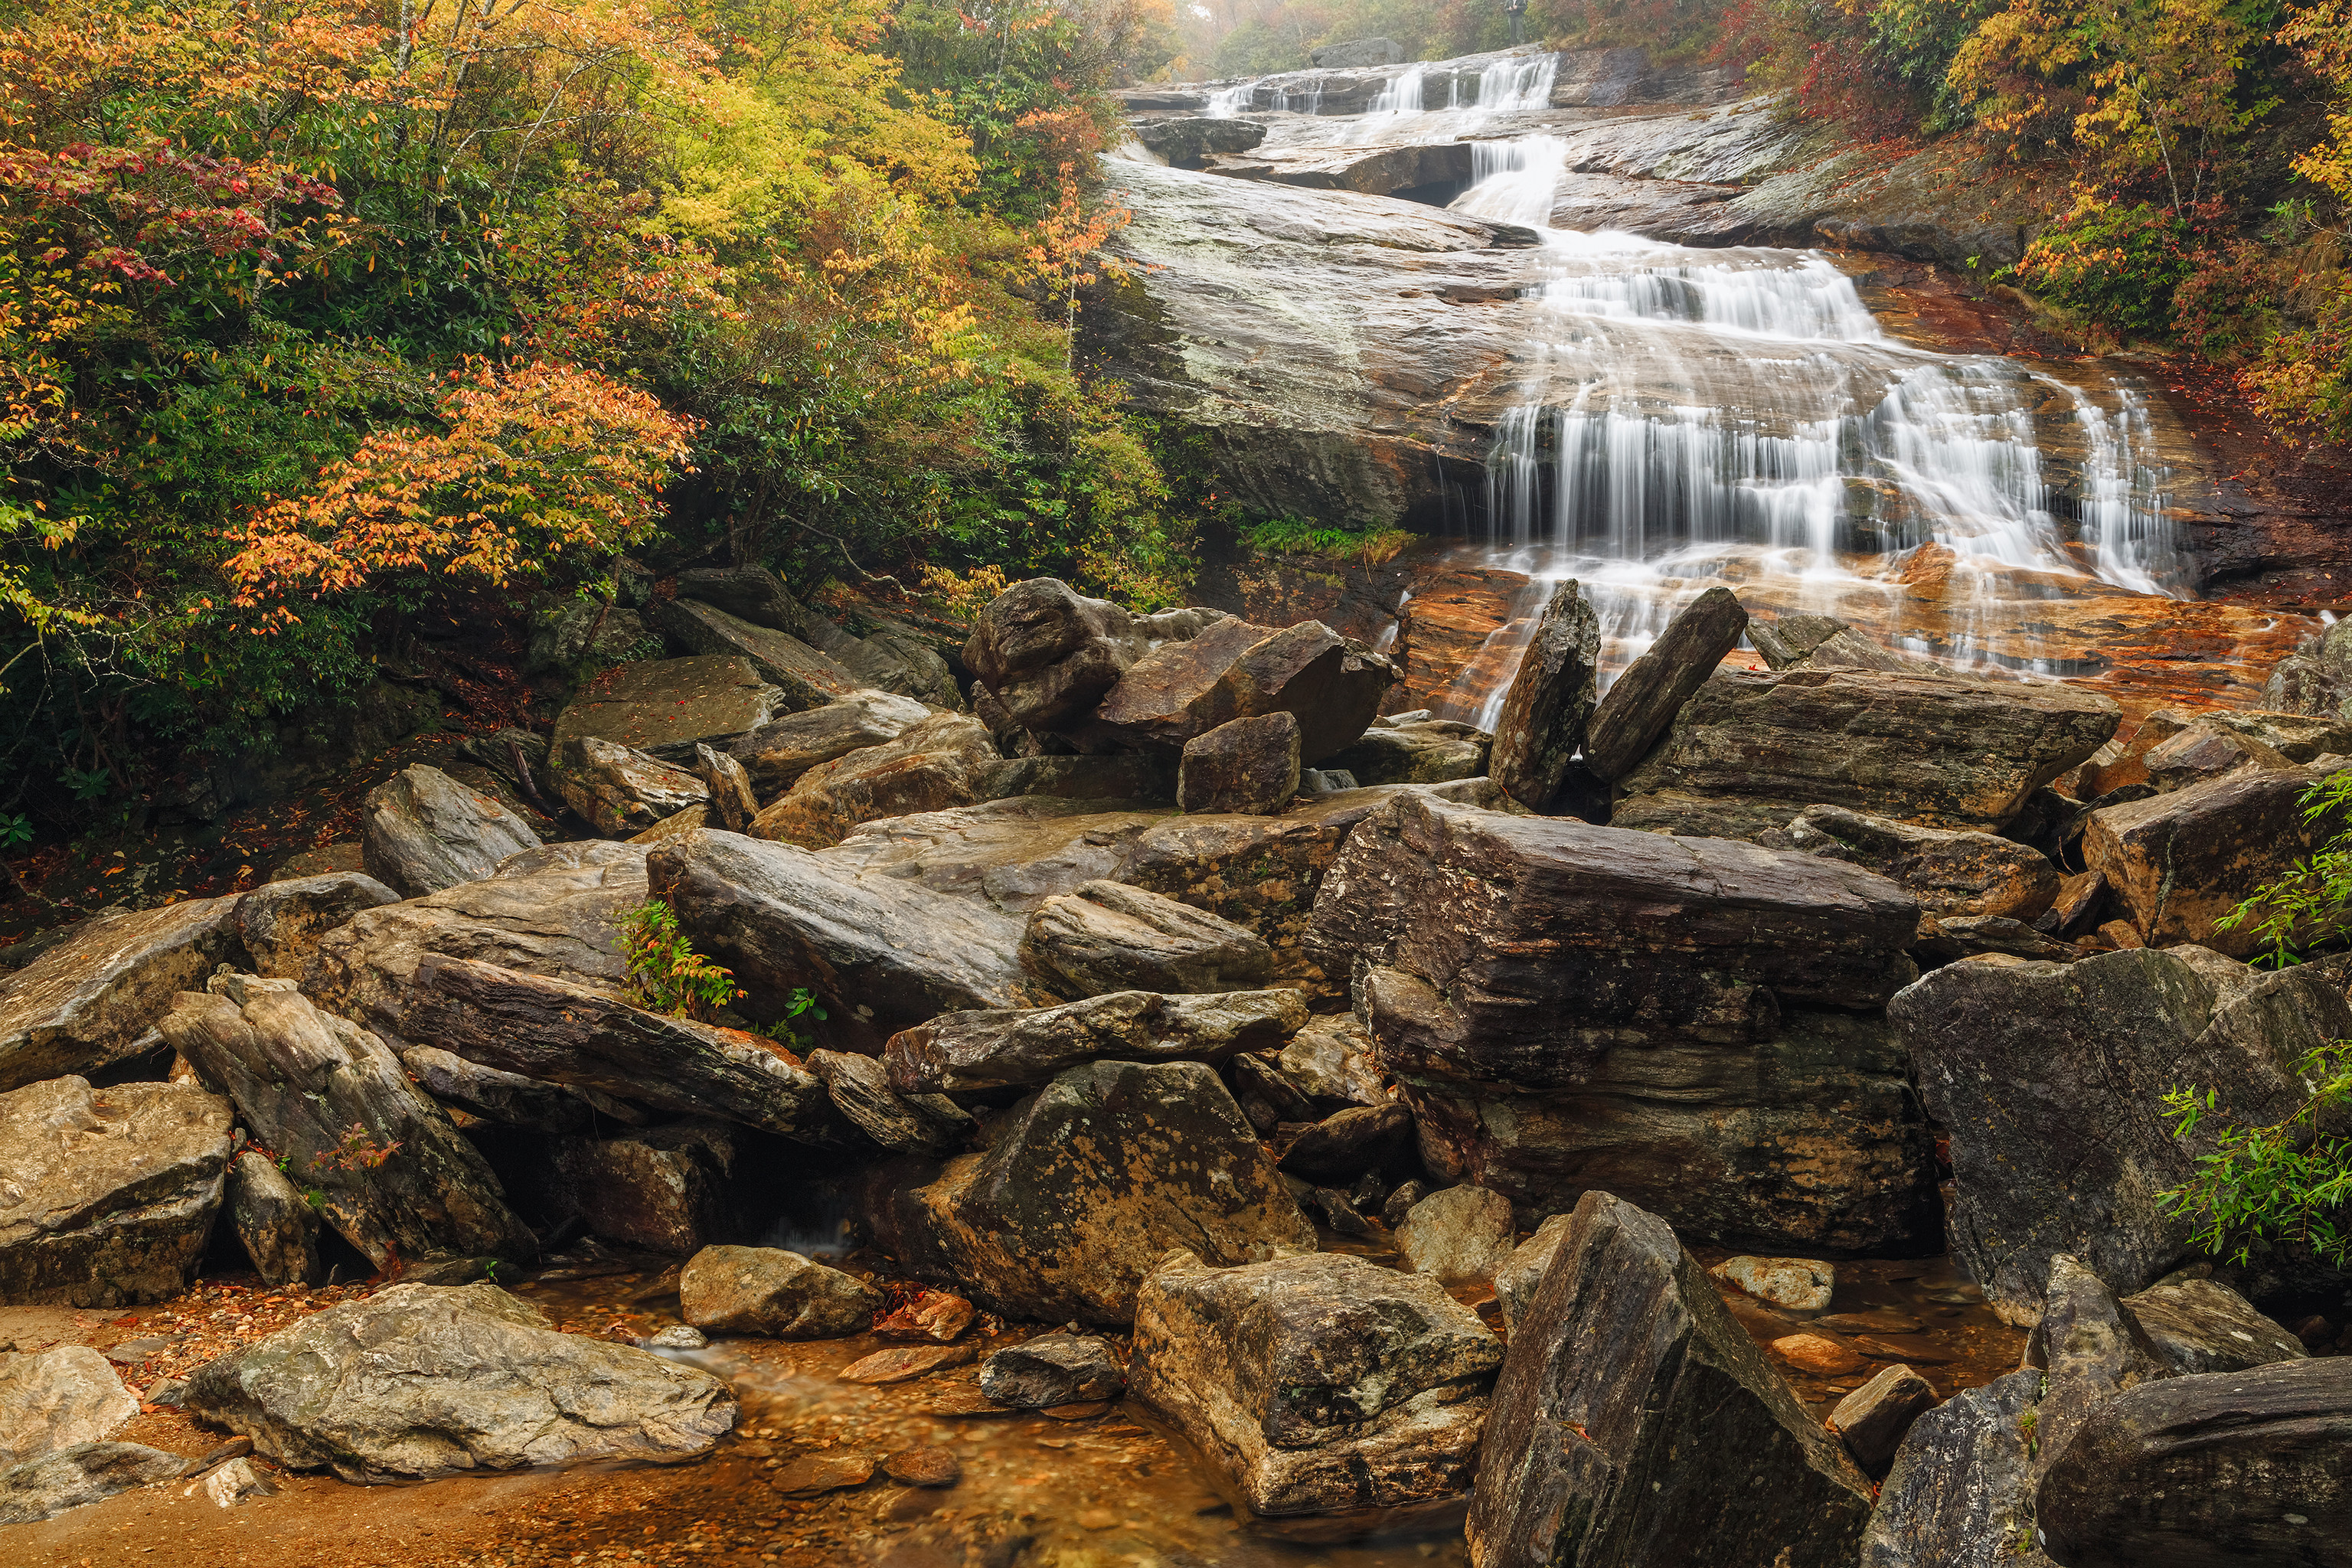 обои Second Falls, Северная Каролина, осень, водопад картинки фото